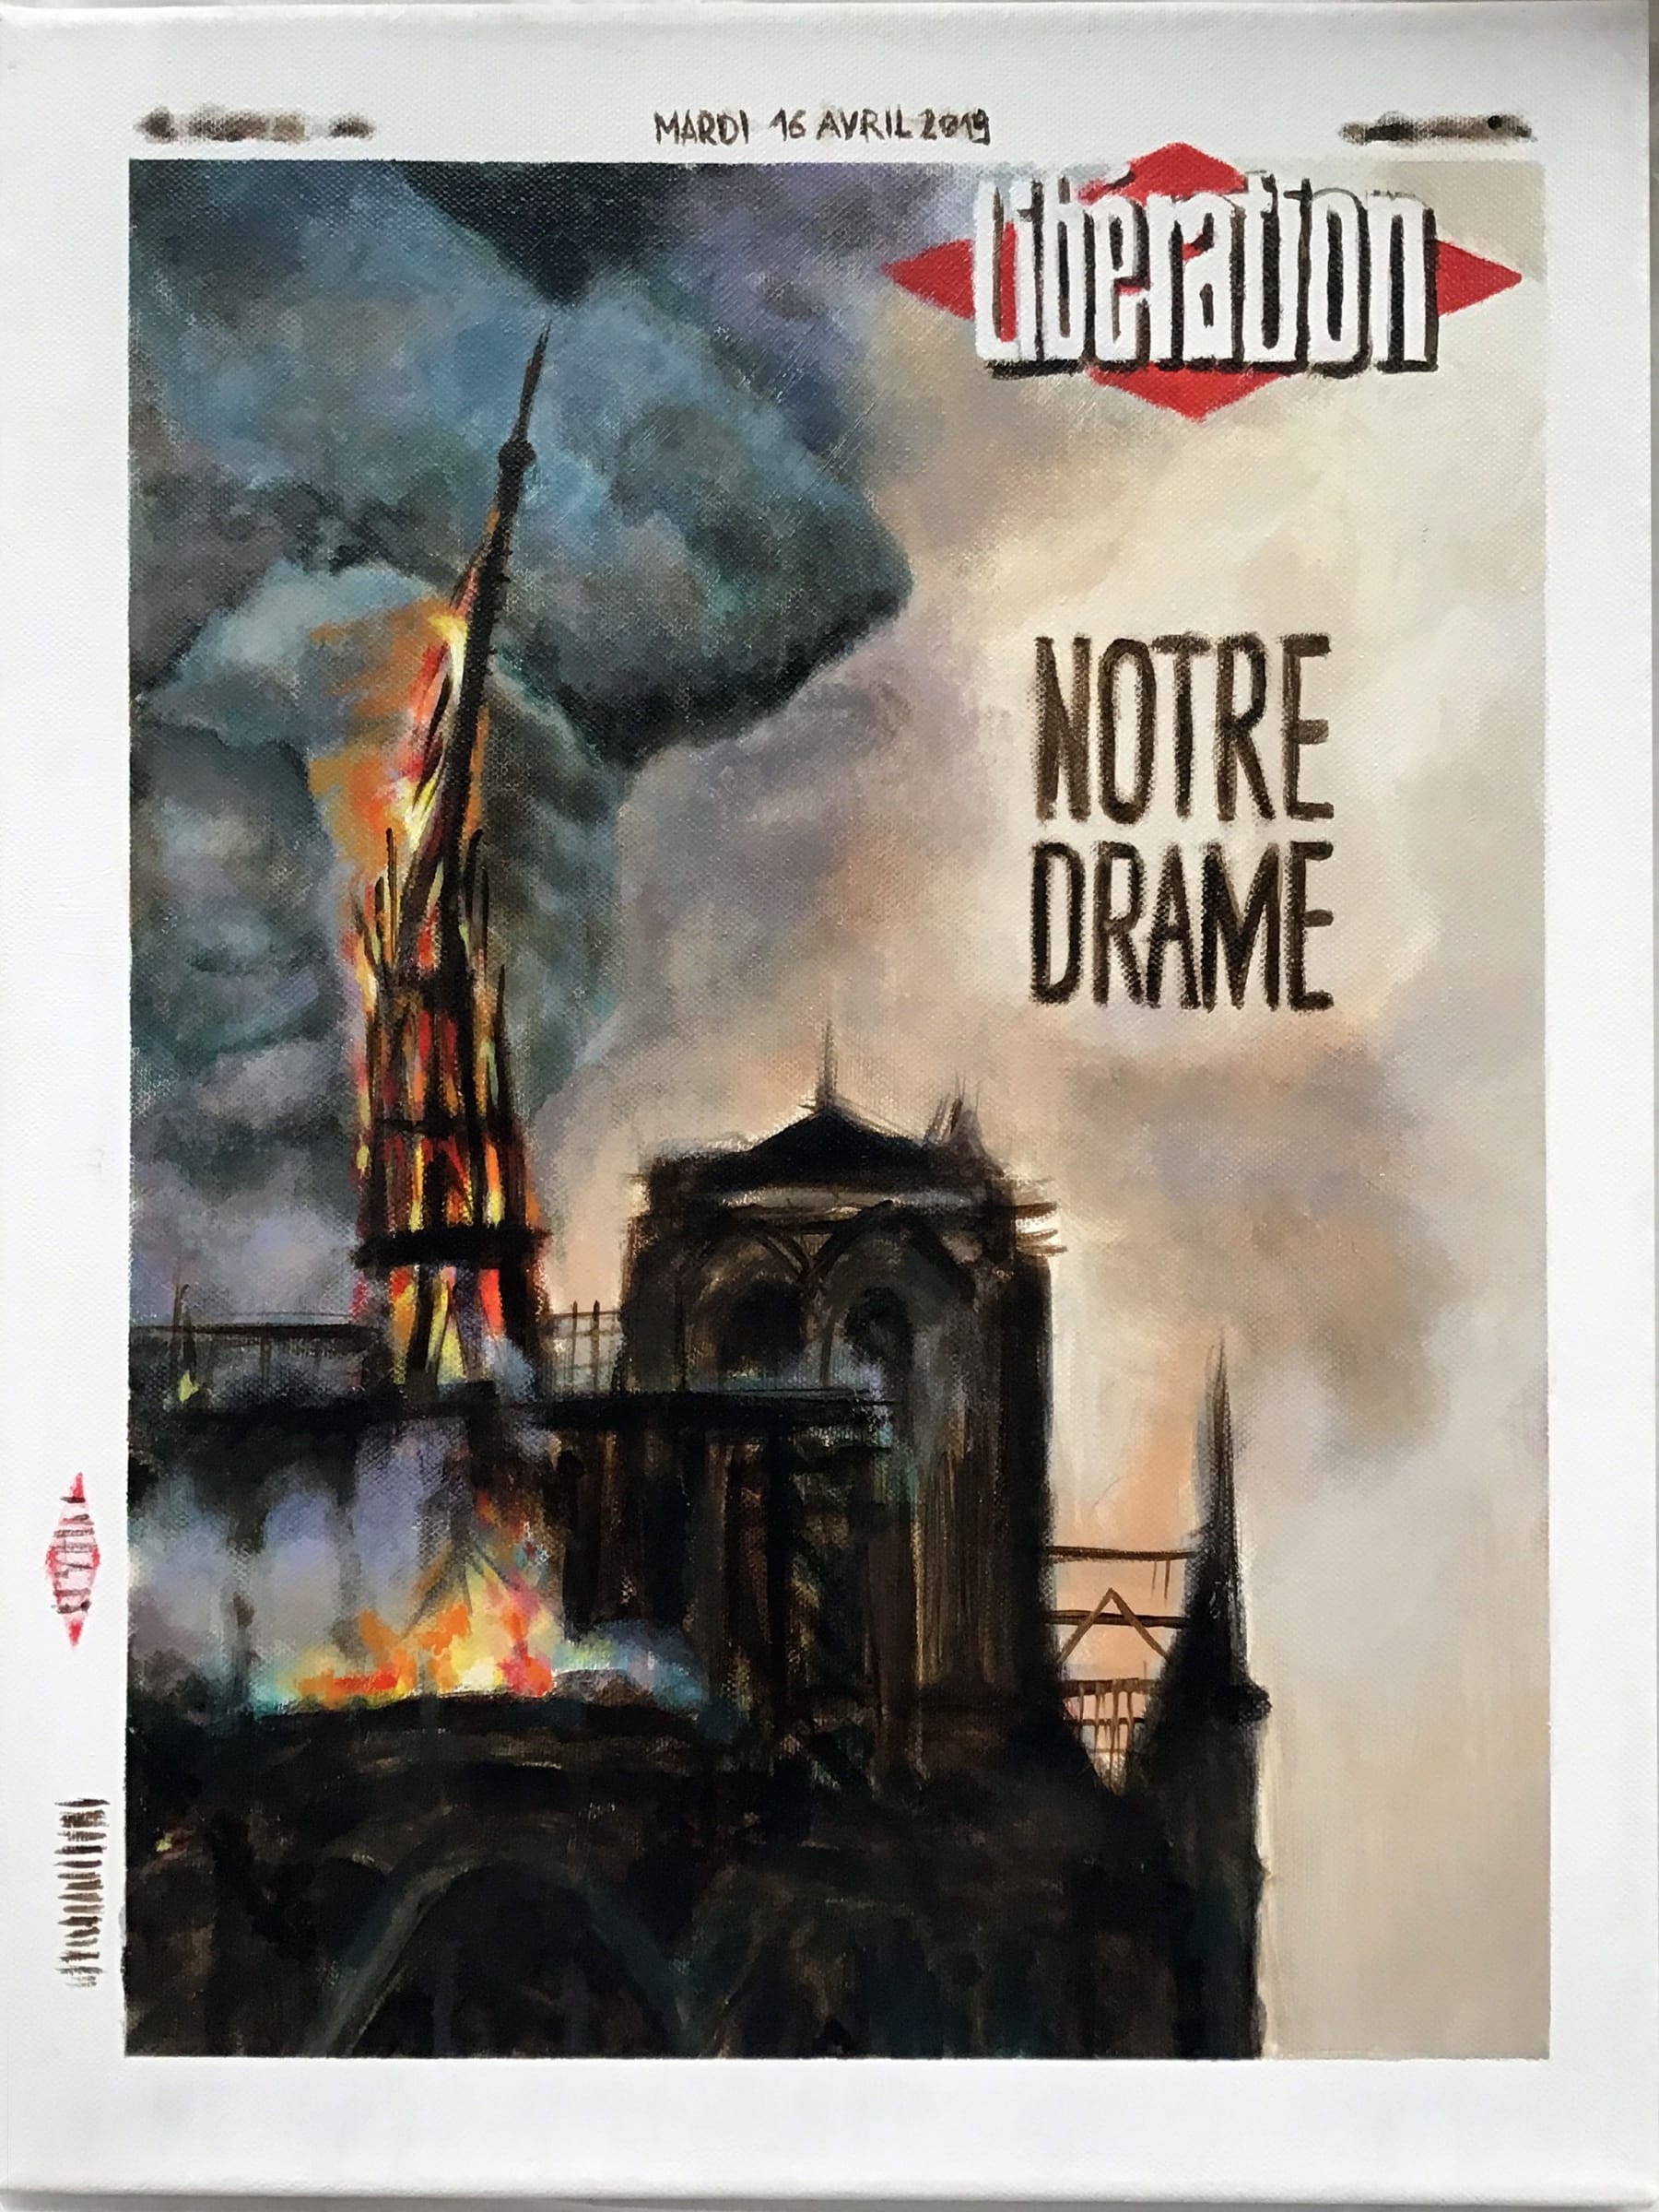 "<span class=""link fancybox-details-link""><a href=""/exhibitions/91/works/artworks11241/"">View Detail Page</a></span><div class=""artist""><strong>Filip MARKIEWICZ</strong></div><div class=""title""><em>Notre Libération</em>, 2019</div><div class=""signed_and_dated"">Signed & dated</div><div class=""medium"">Oil on canvas</div><div class=""dimensions"">56 x 41 cm<br>22 1/8 x 16 1/8 in</div>"